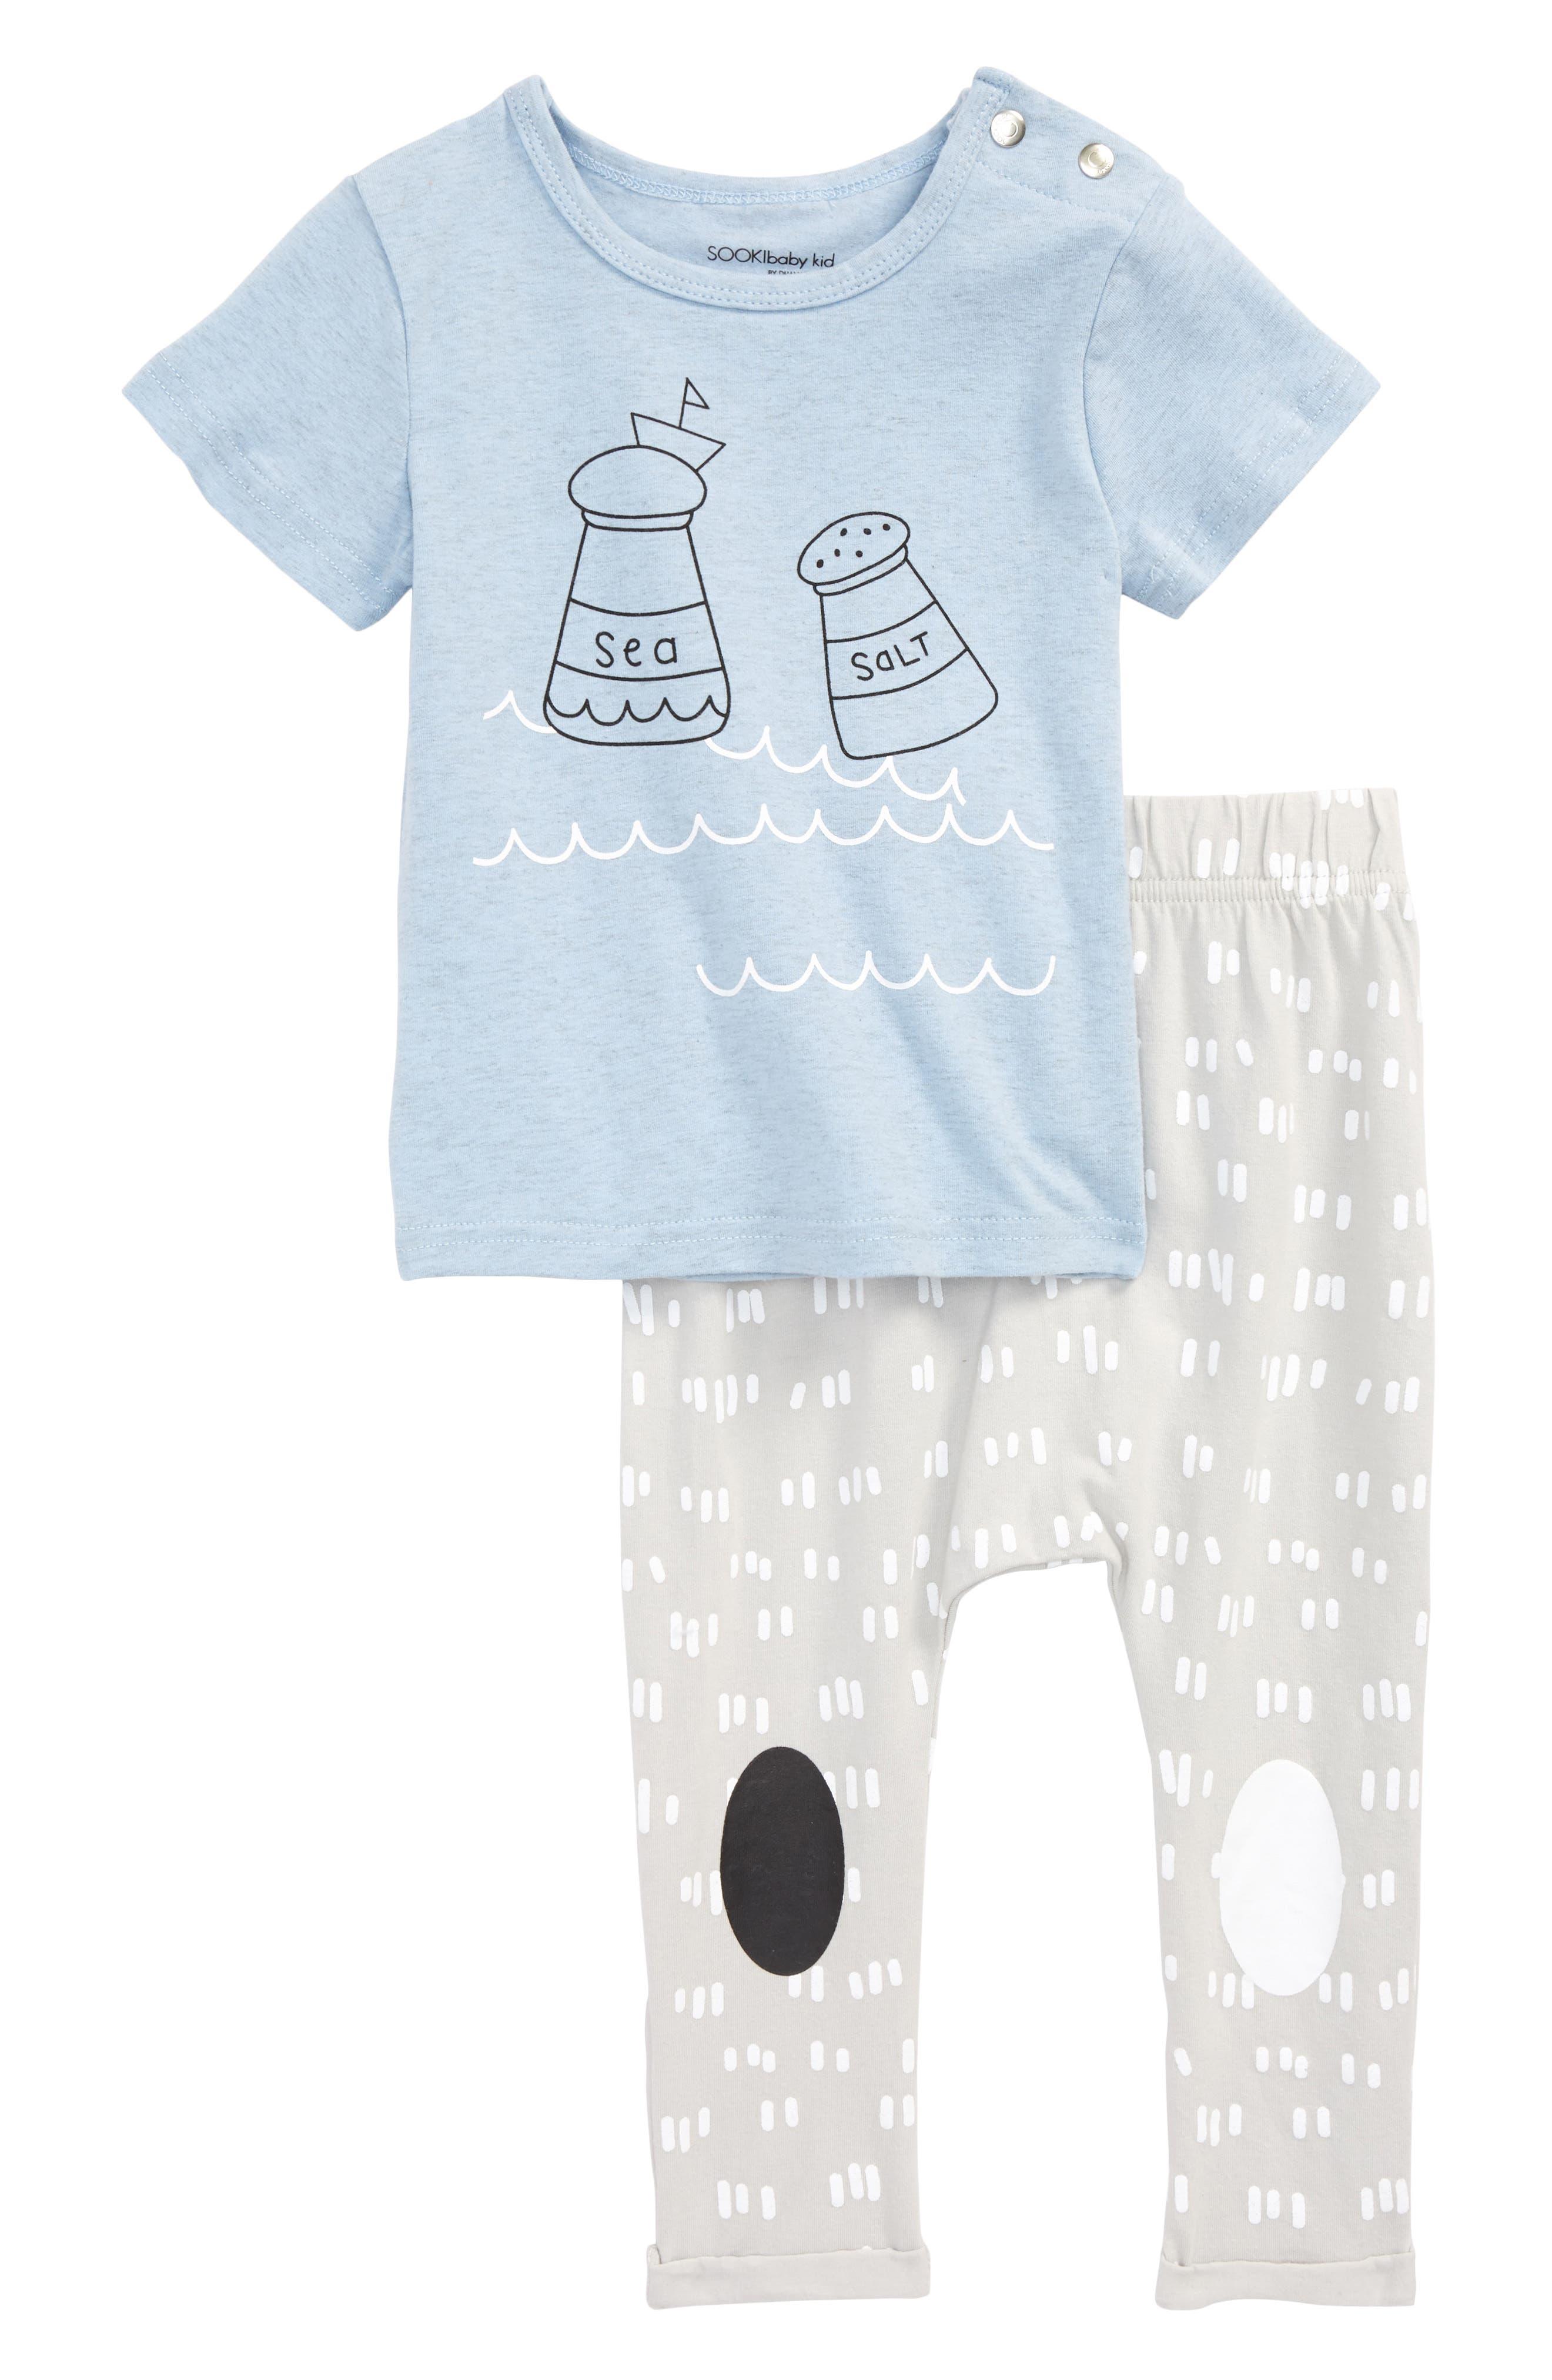 Sea-Salt T-Shirt & Leggings Set,                             Main thumbnail 1, color,                             499